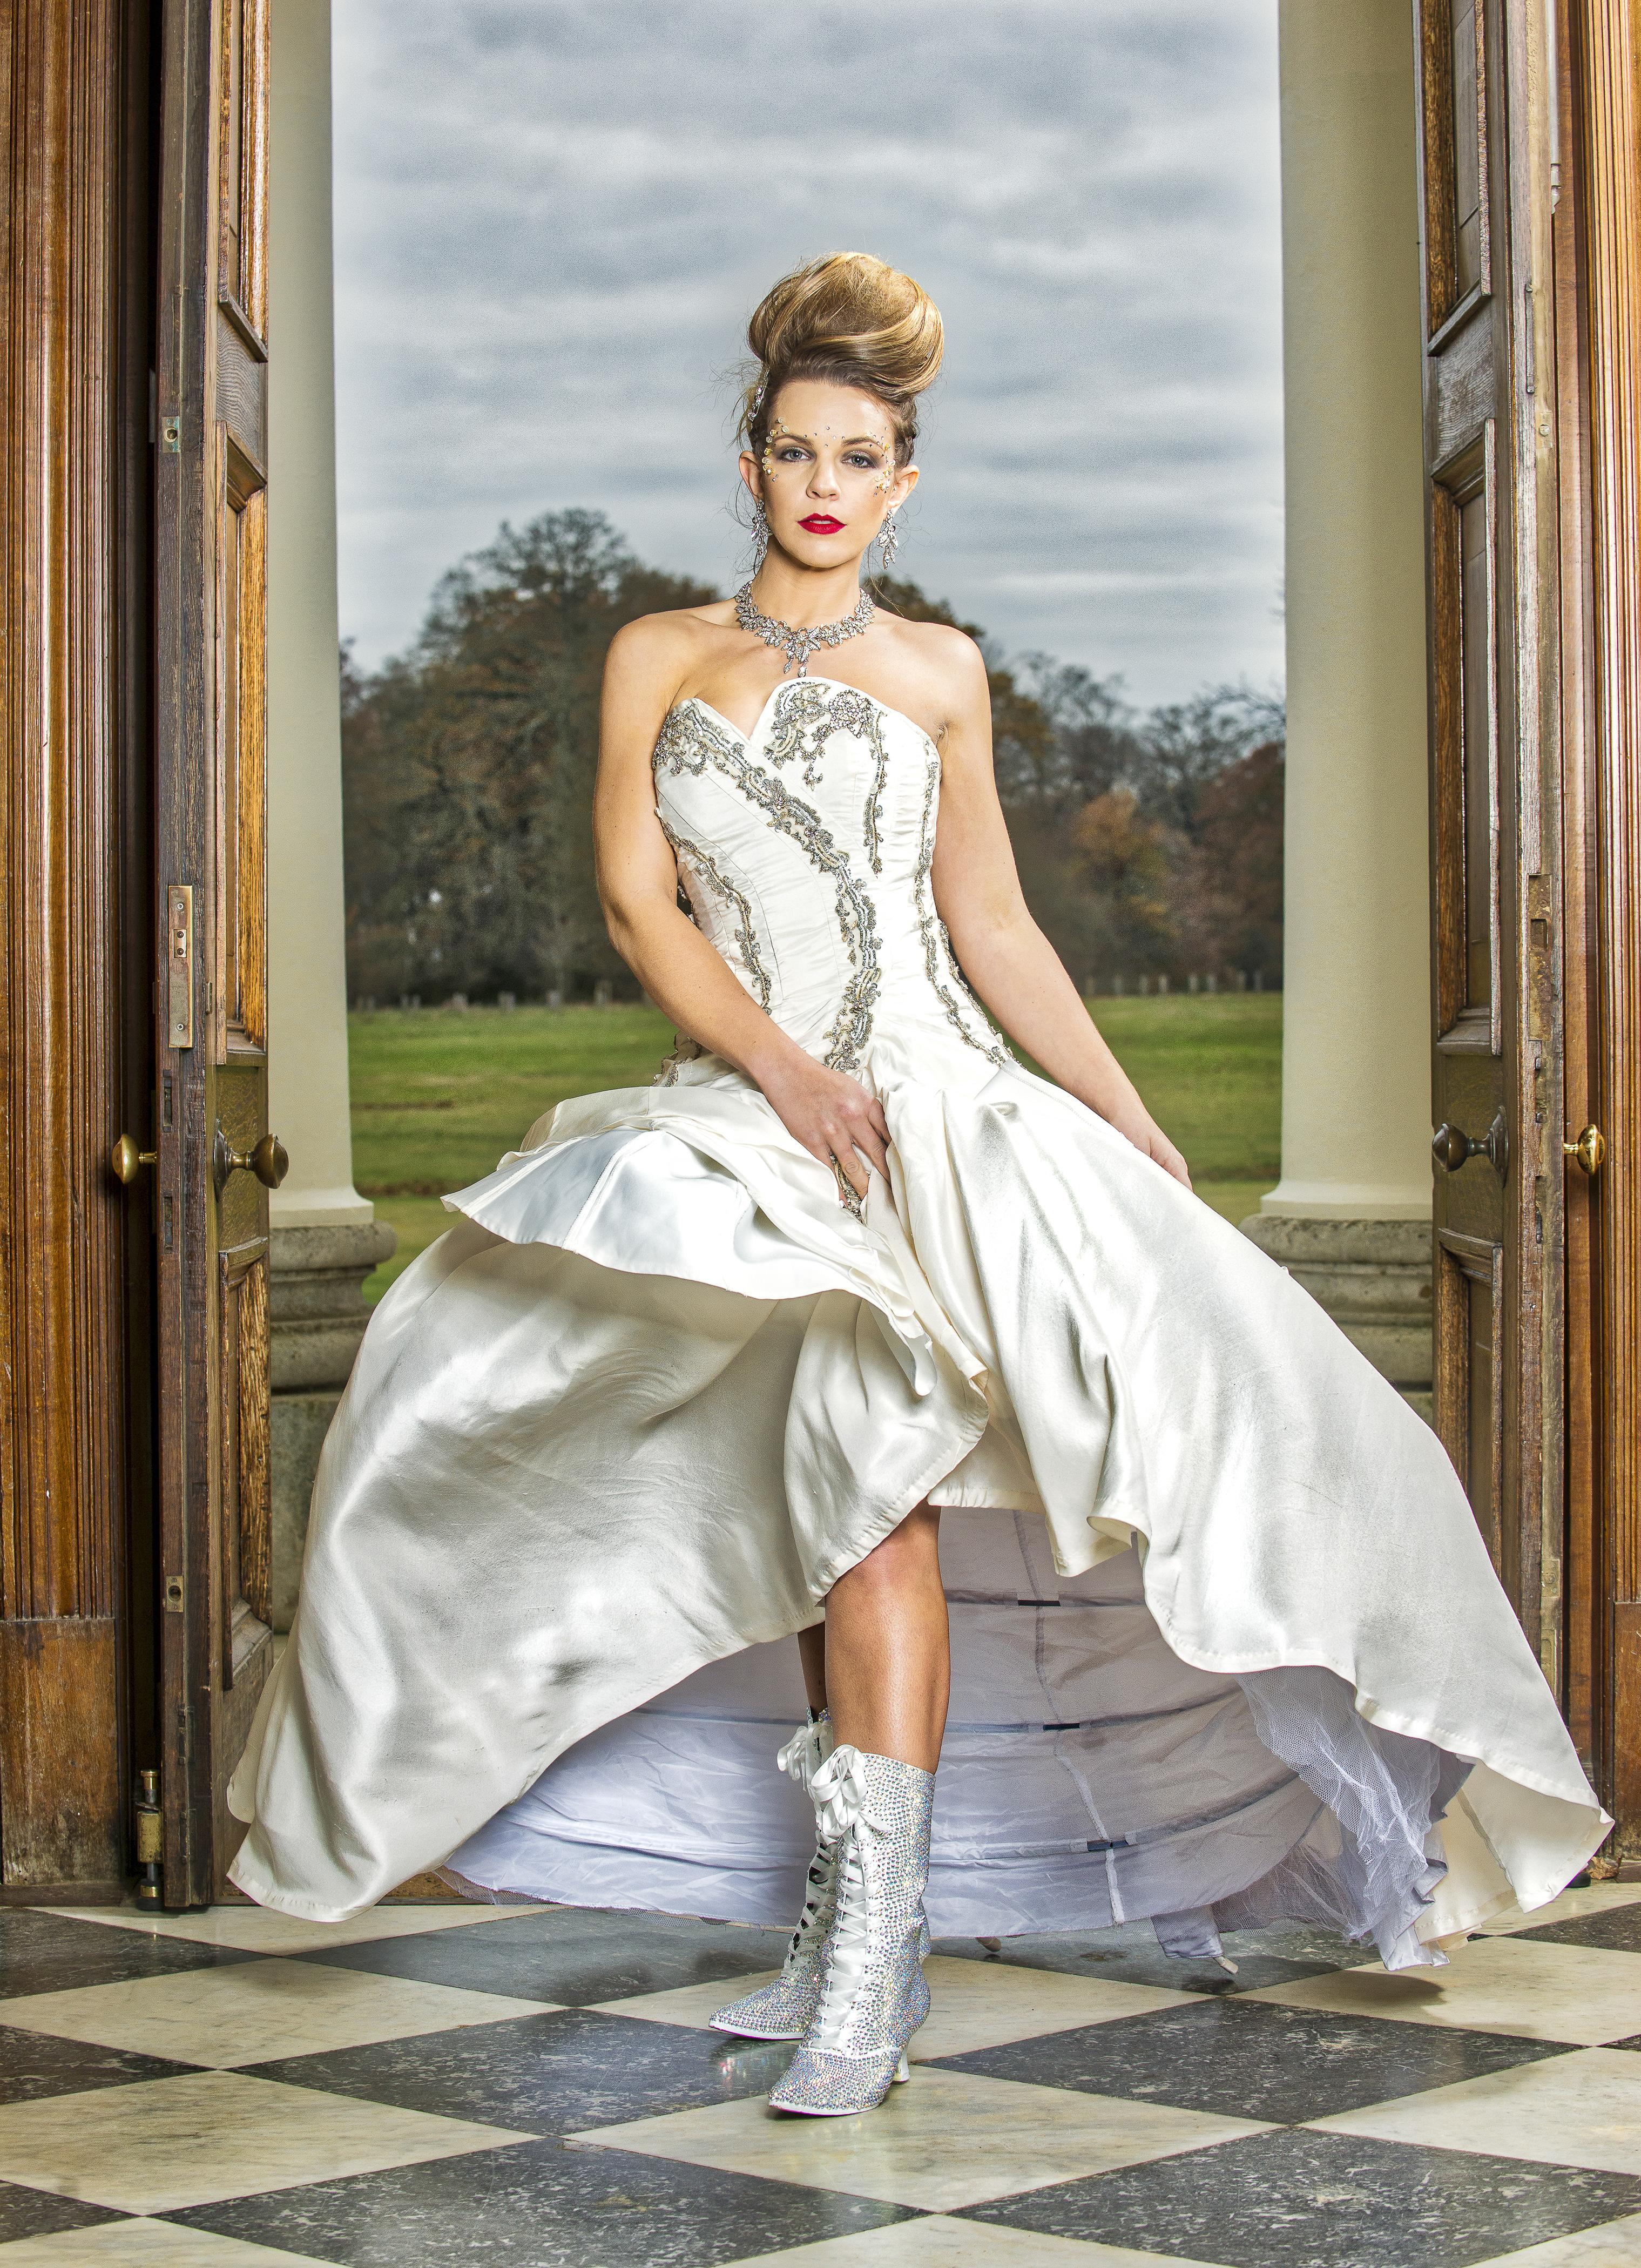 Fashion_Cinderella-076-John Ferguson_